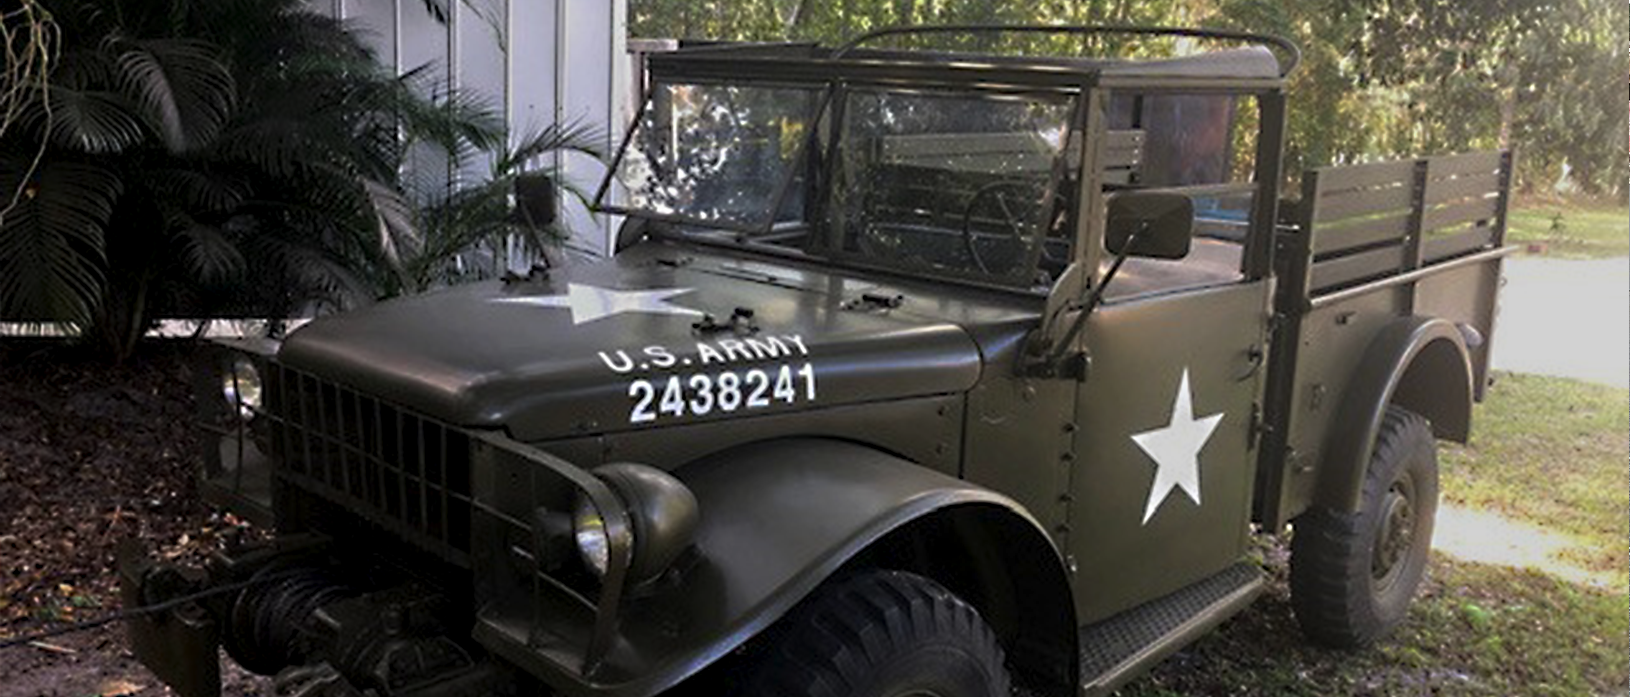 1953 Dodge M37 Military Pickup